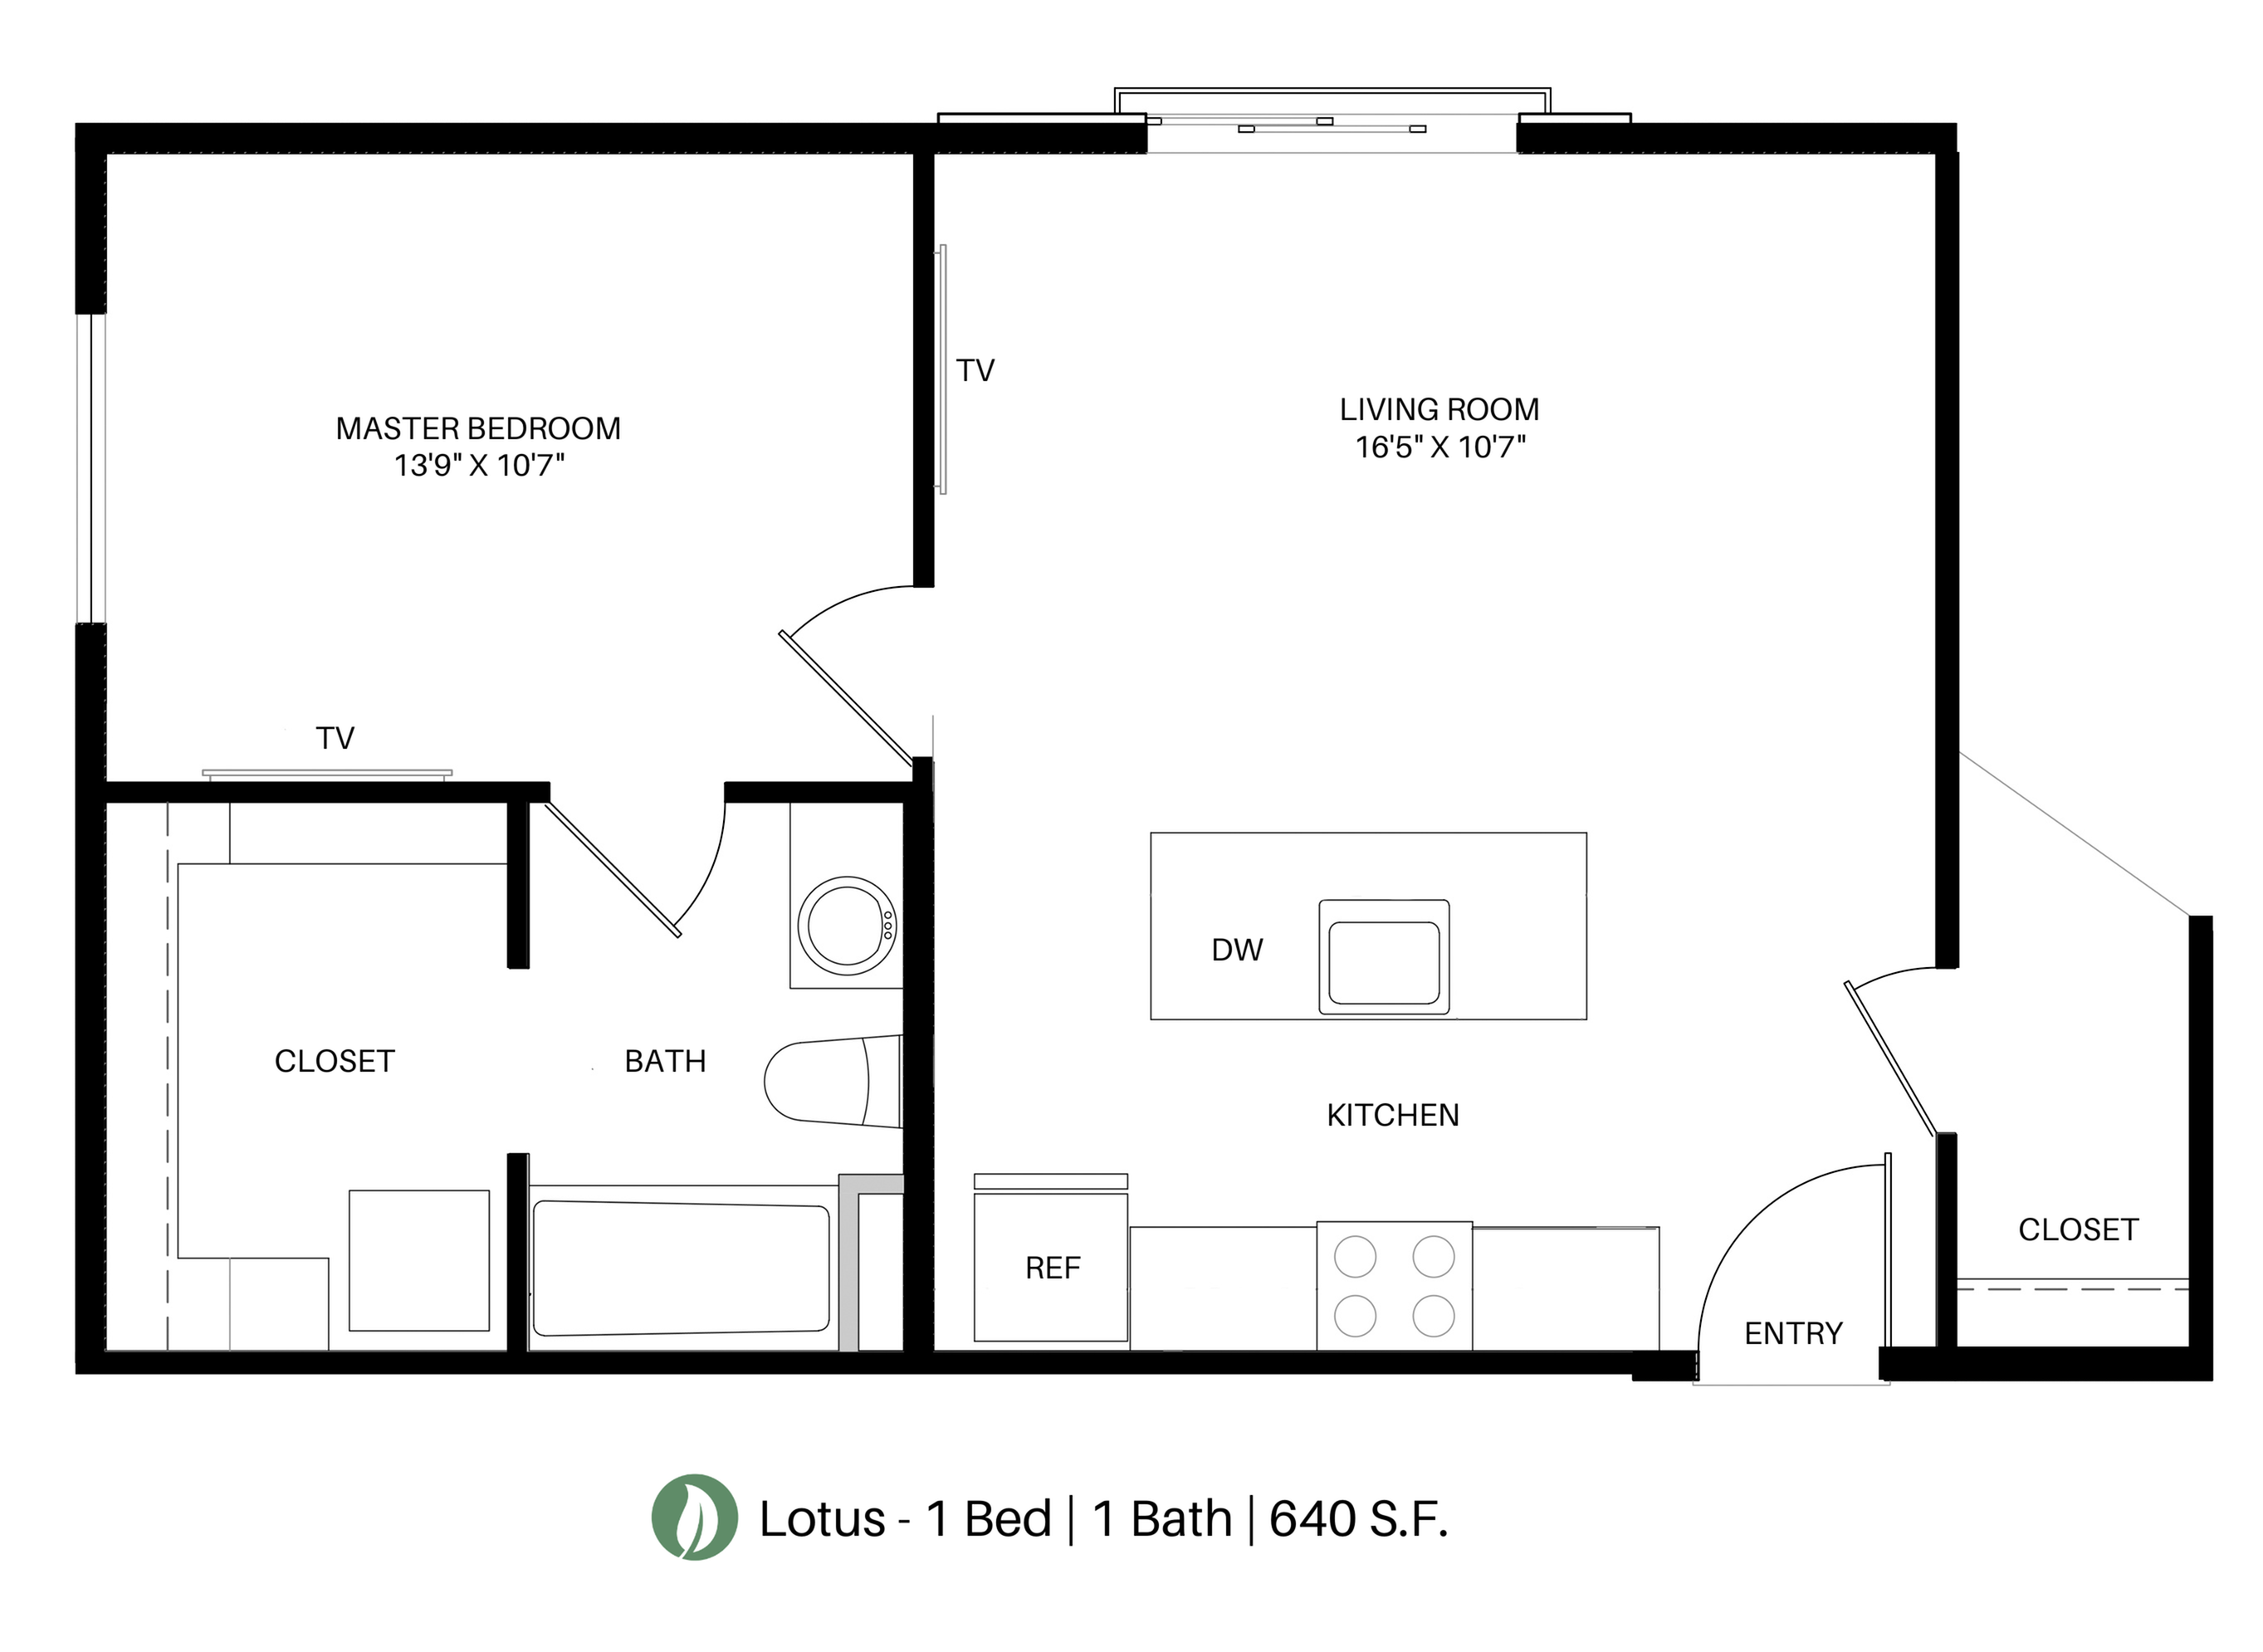 The Lotus Floor Plan Layout